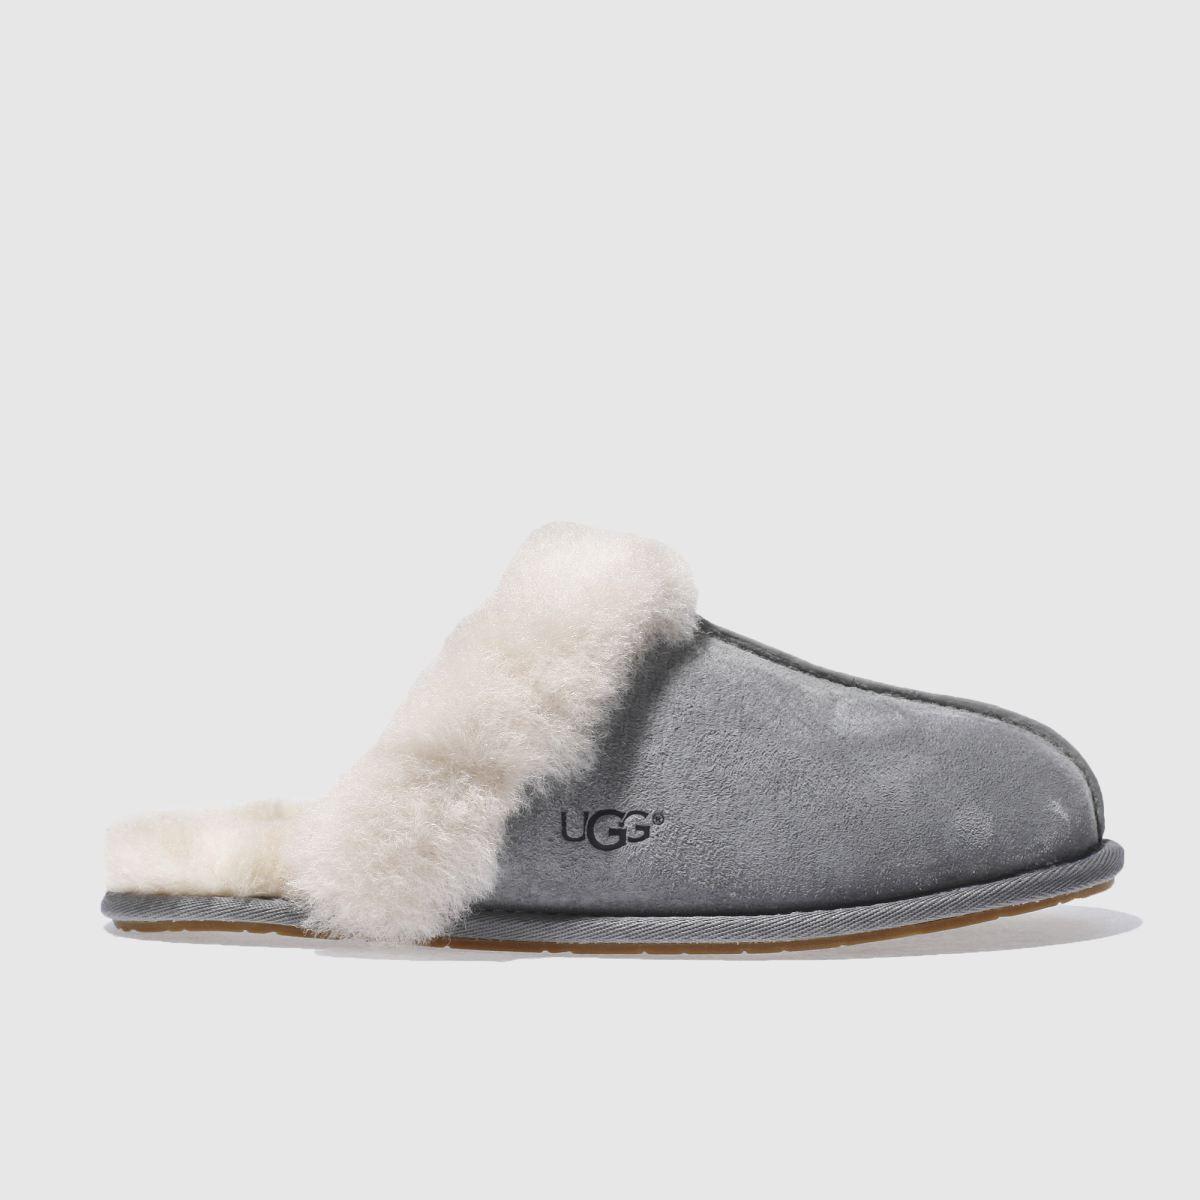 ugg dark grey scuffette slippers